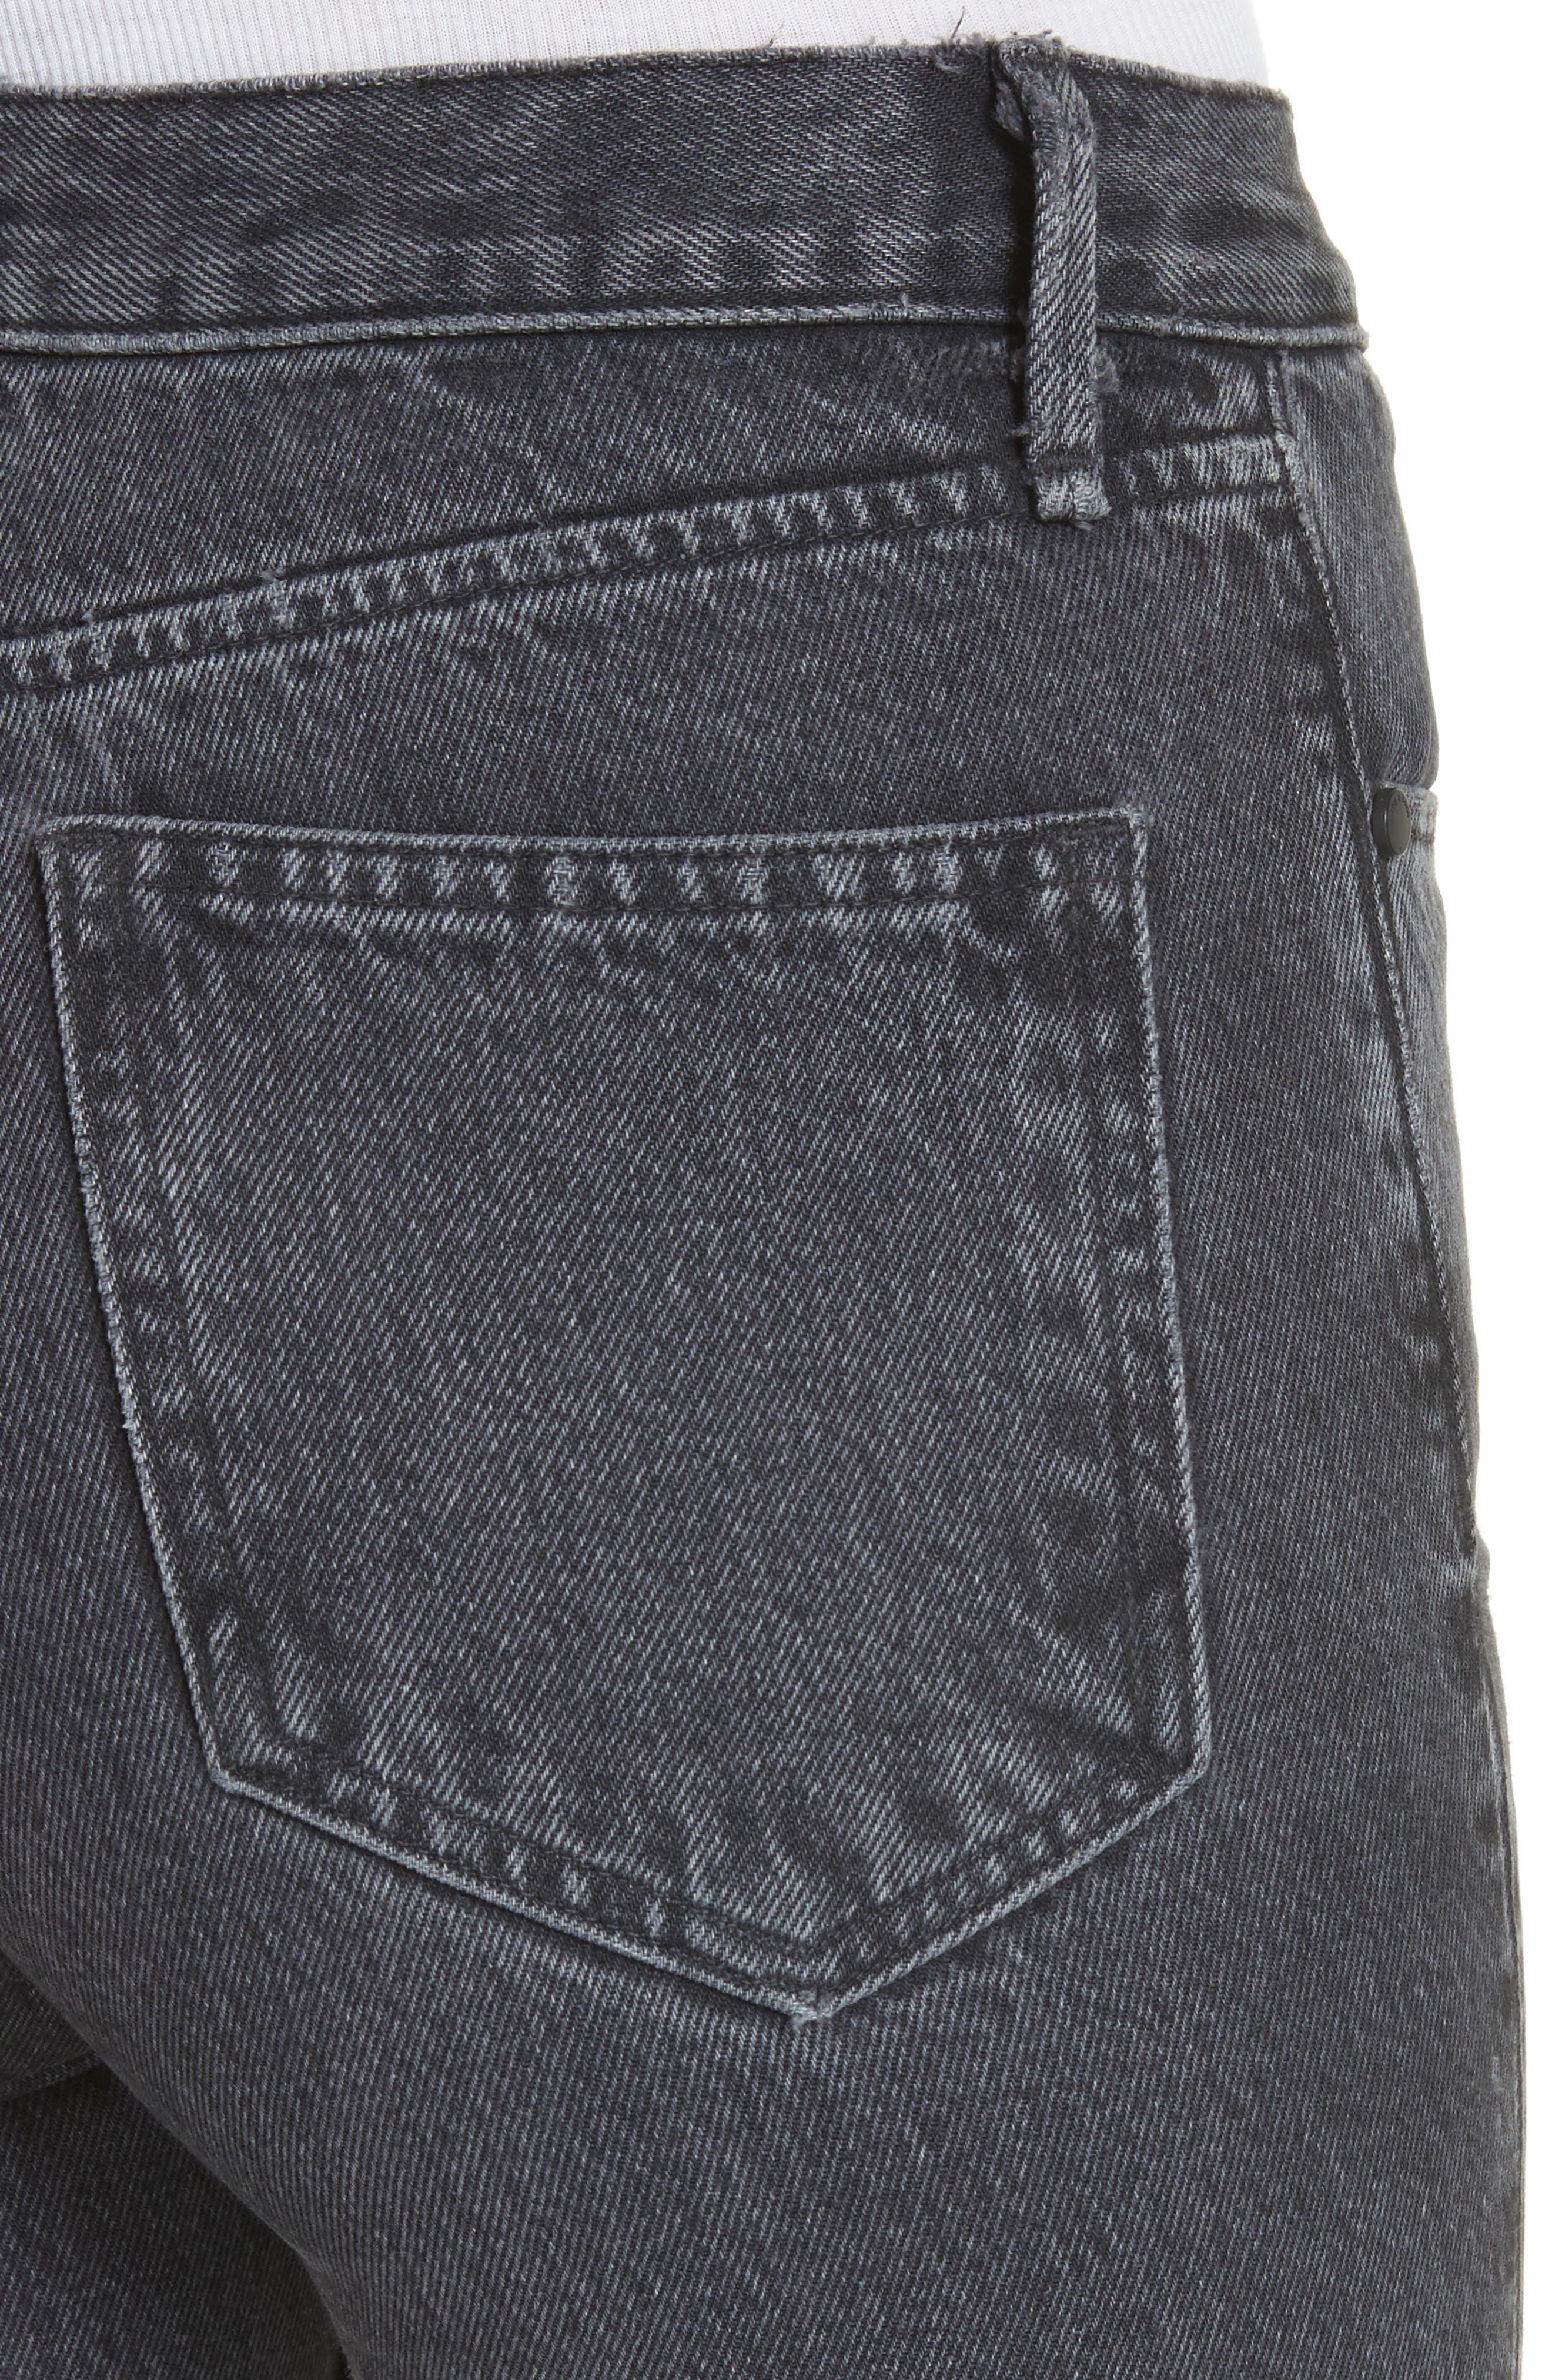 Dylan High Waist Crop Kick Flare Jeans,                             Alternate thumbnail 4, color,                             021